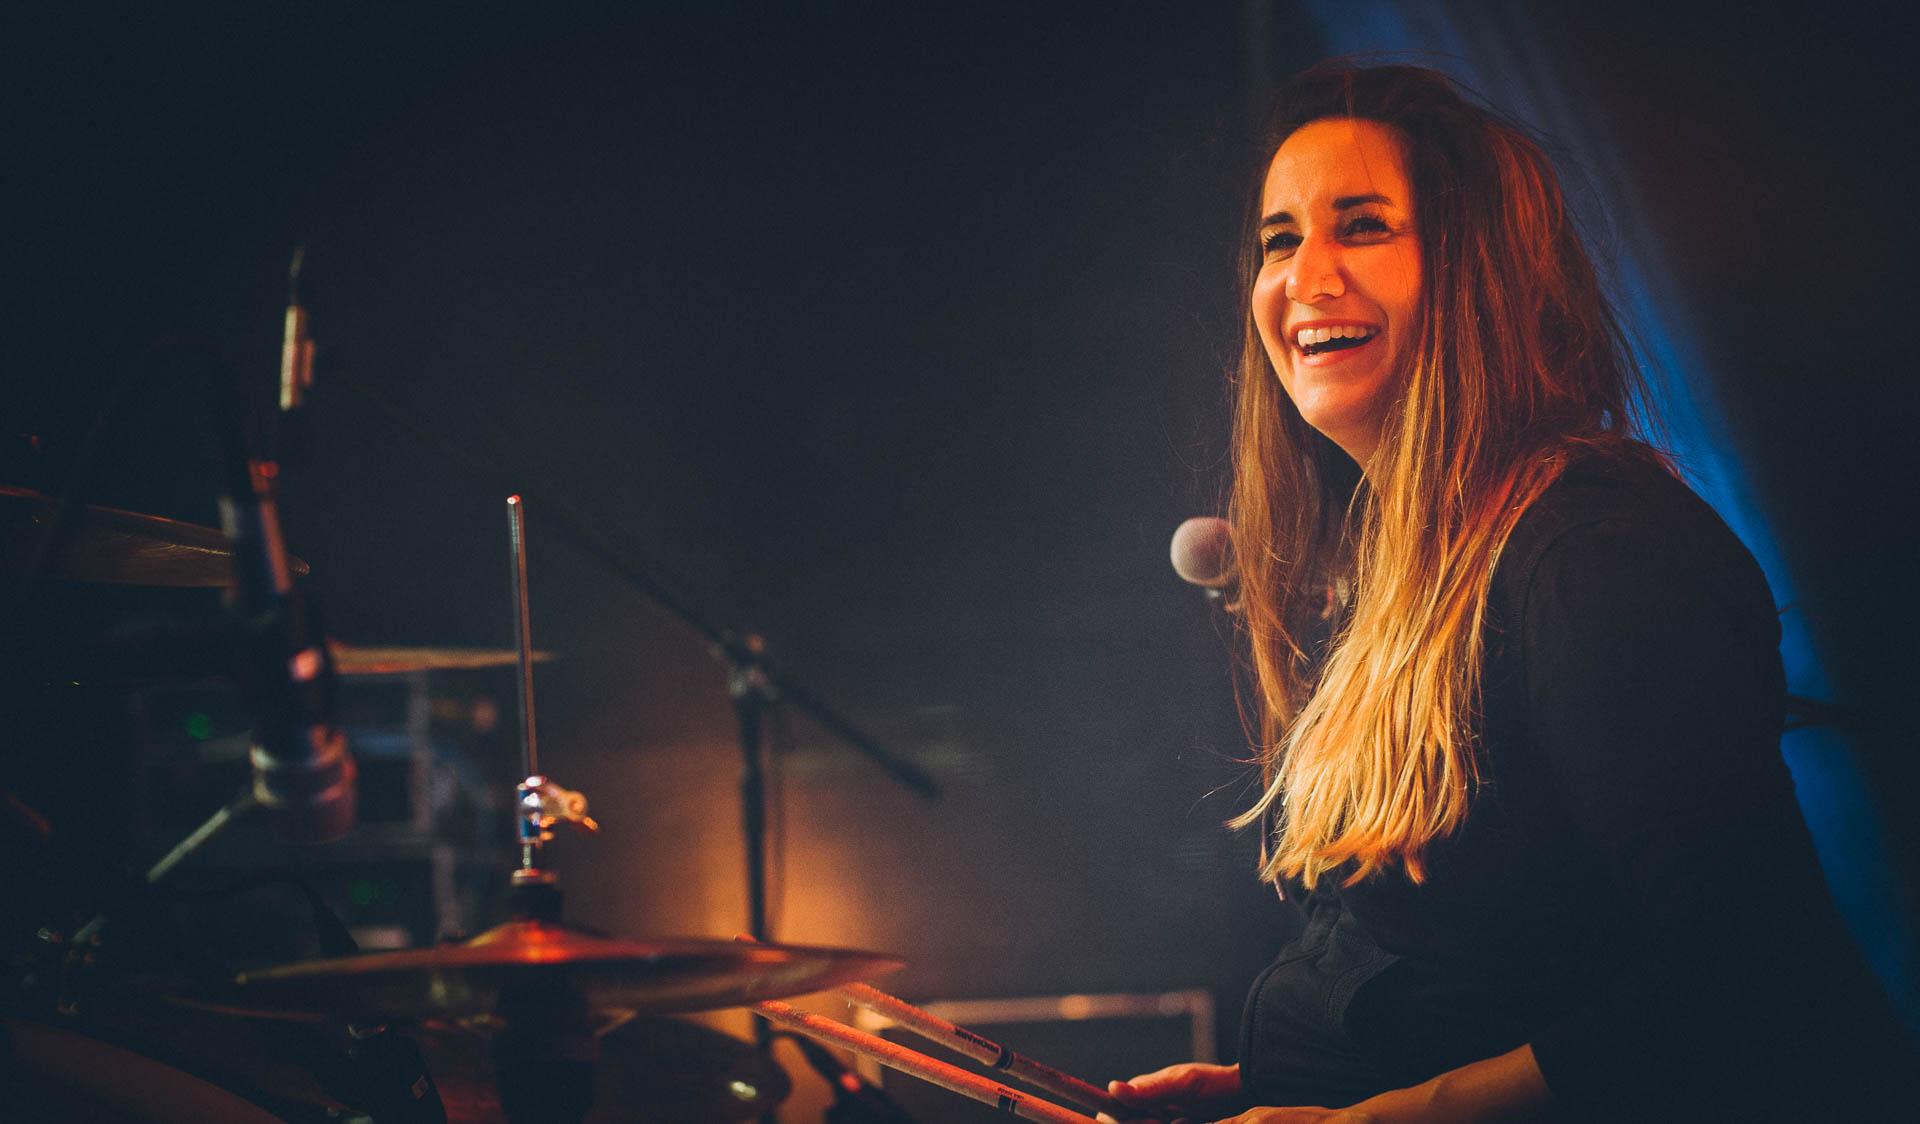 Konzert Berlin Fotograf Schlagzeugerin Lachen